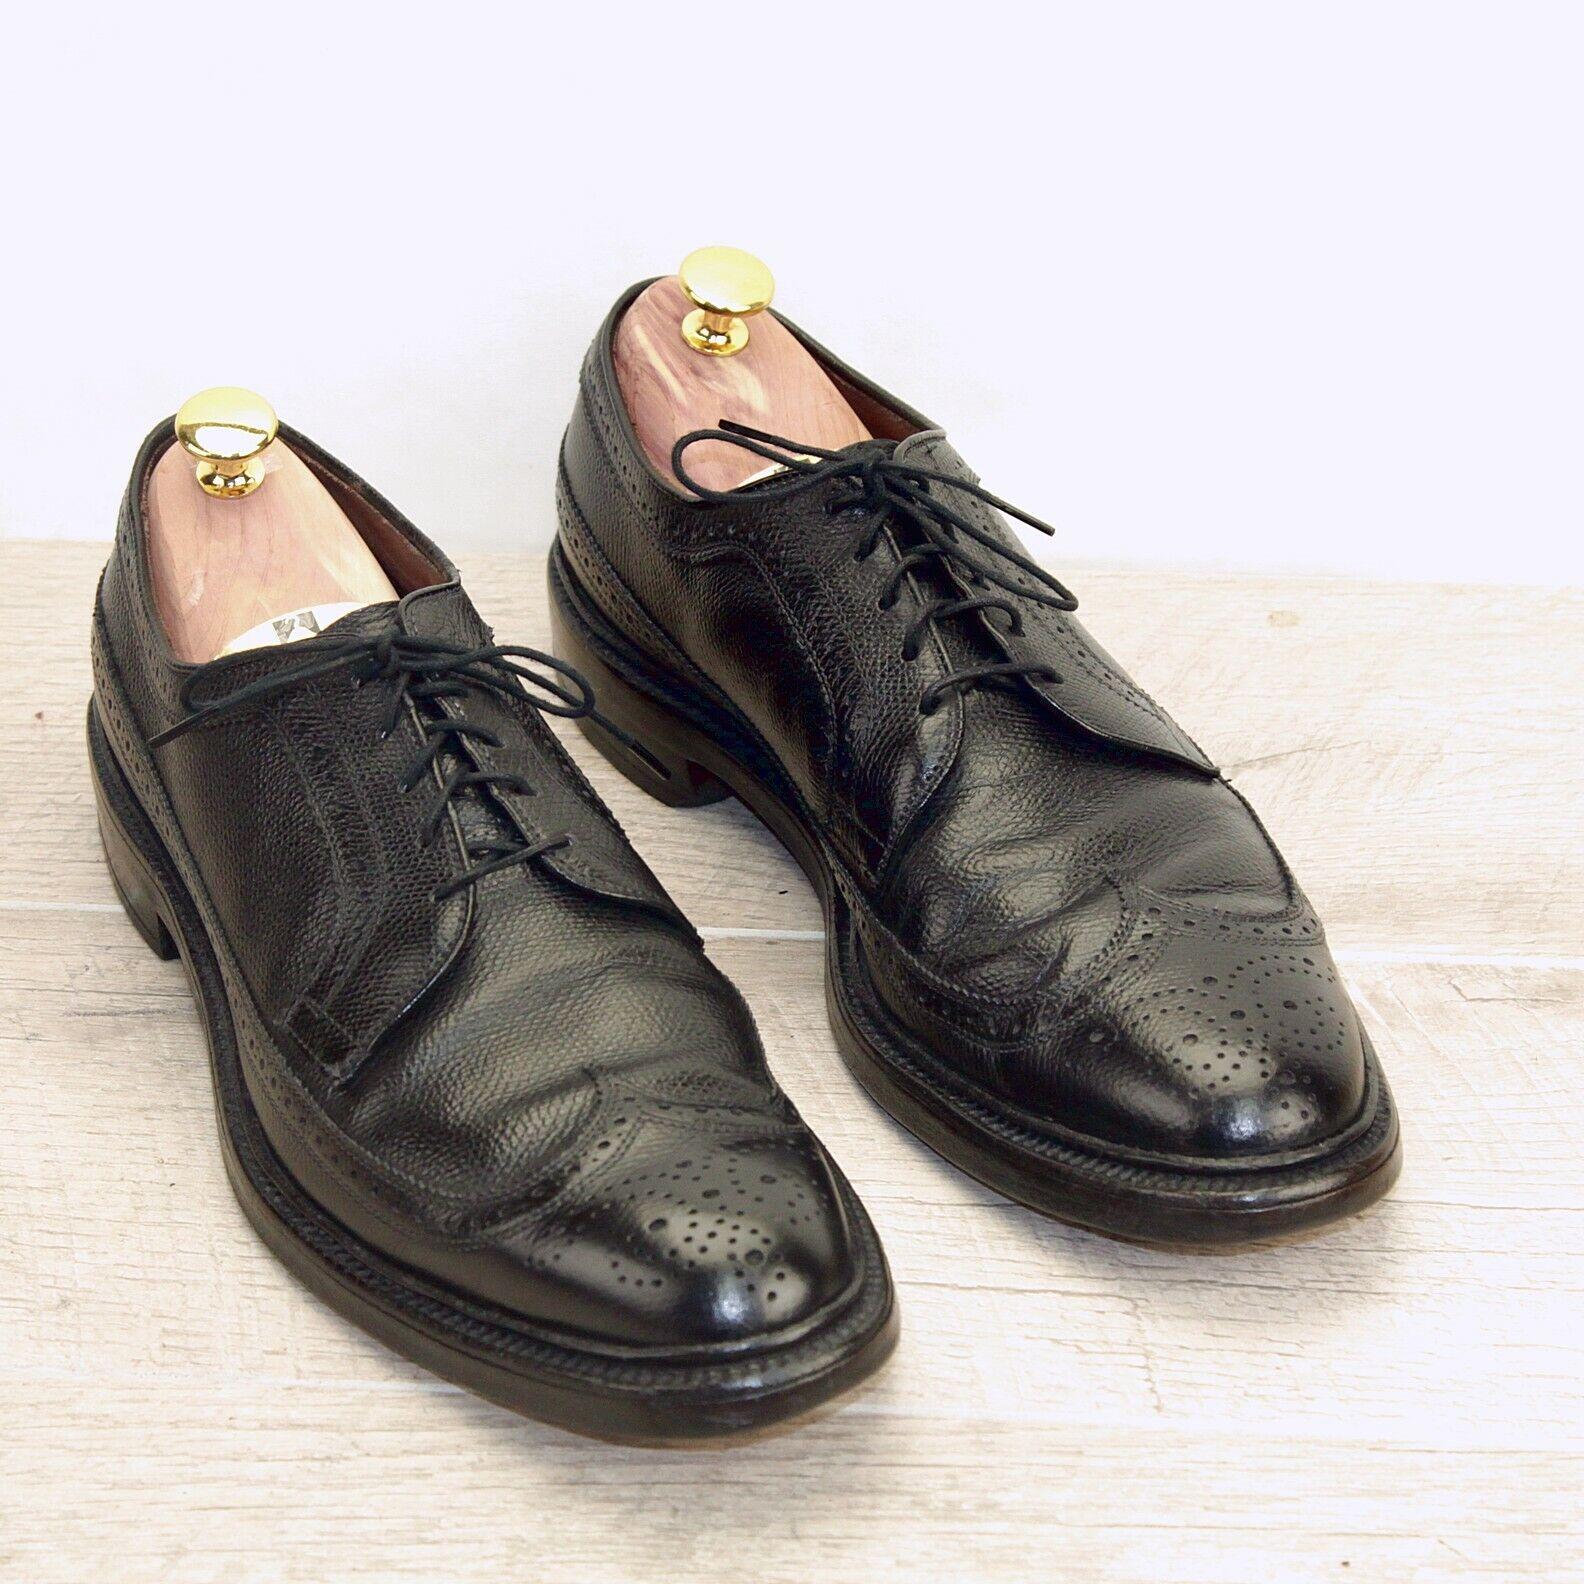 Allen Edmonds MACNEIL  10.5 A  Black   new AE Bags (add  15 new shoes Trees)